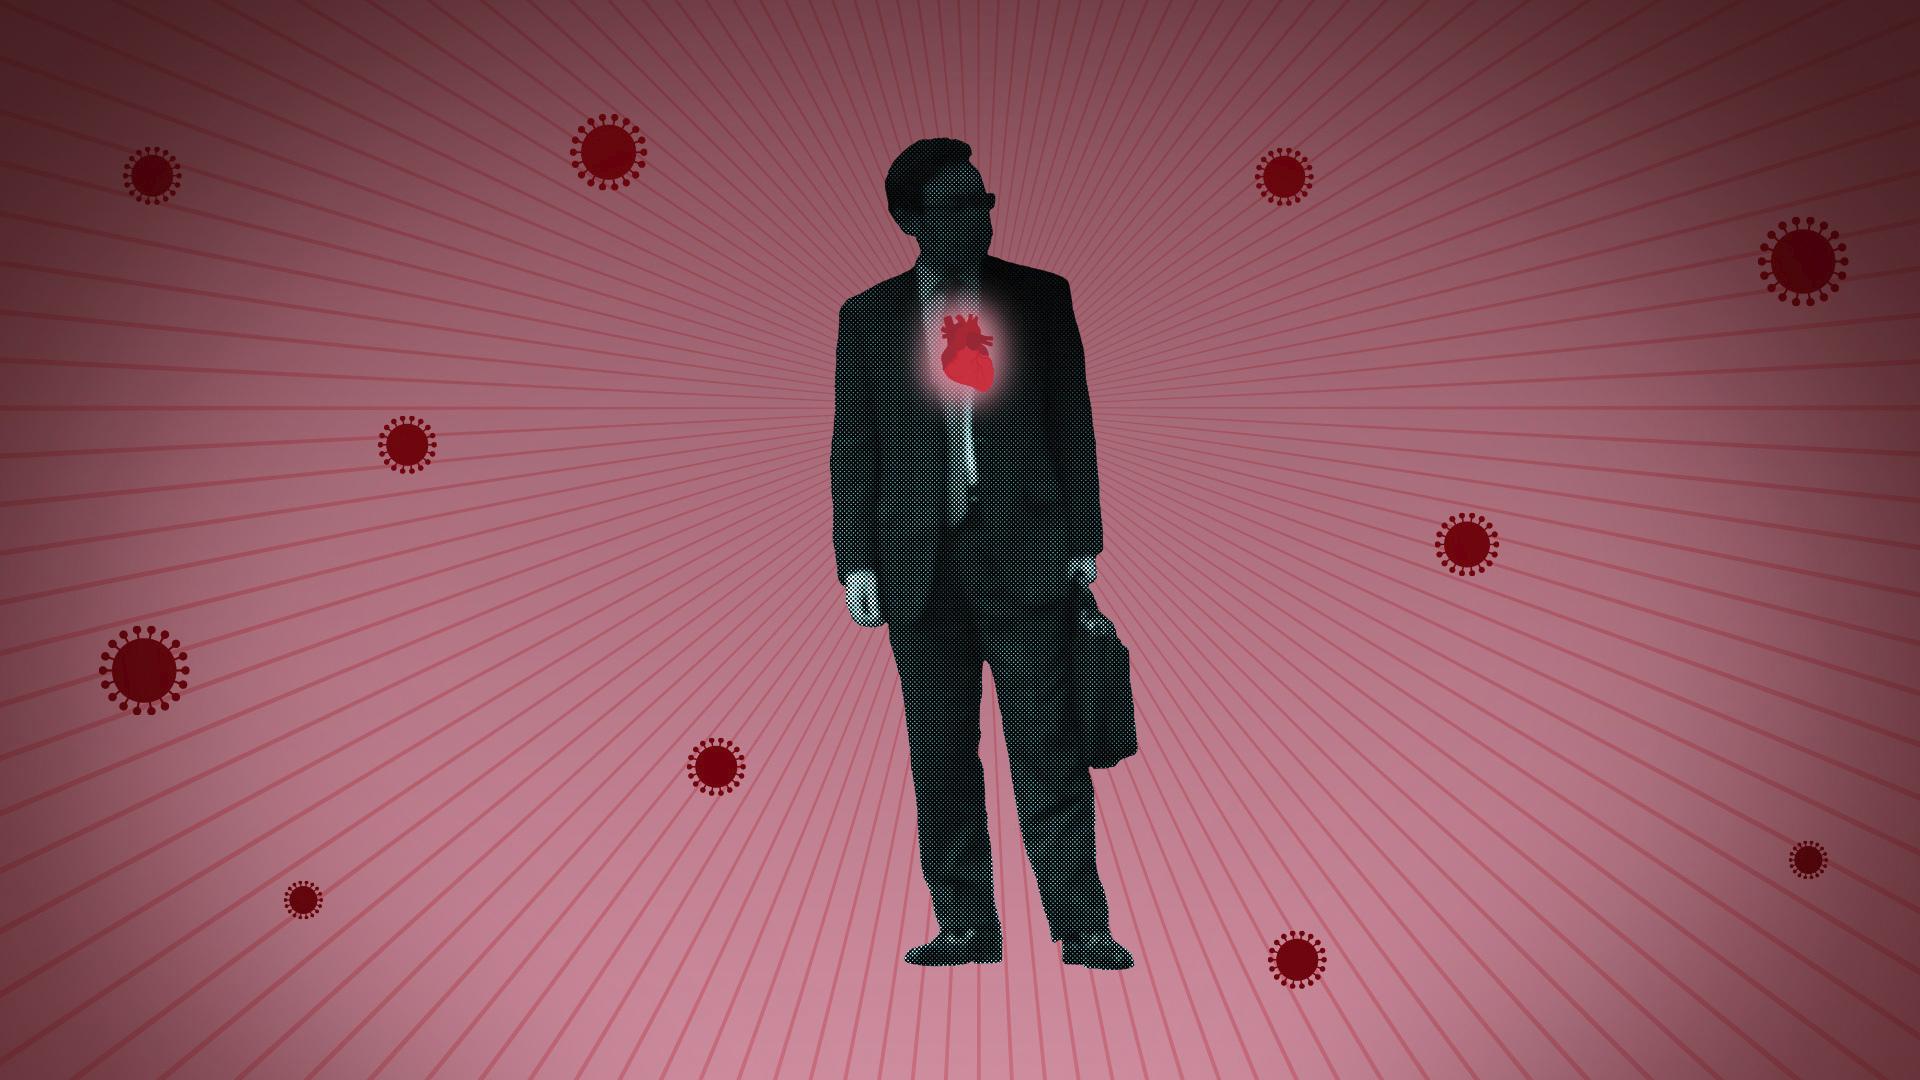 VIRUS OUTBREAK VIRAL QUESTIONS CORONAVIRUS HEART